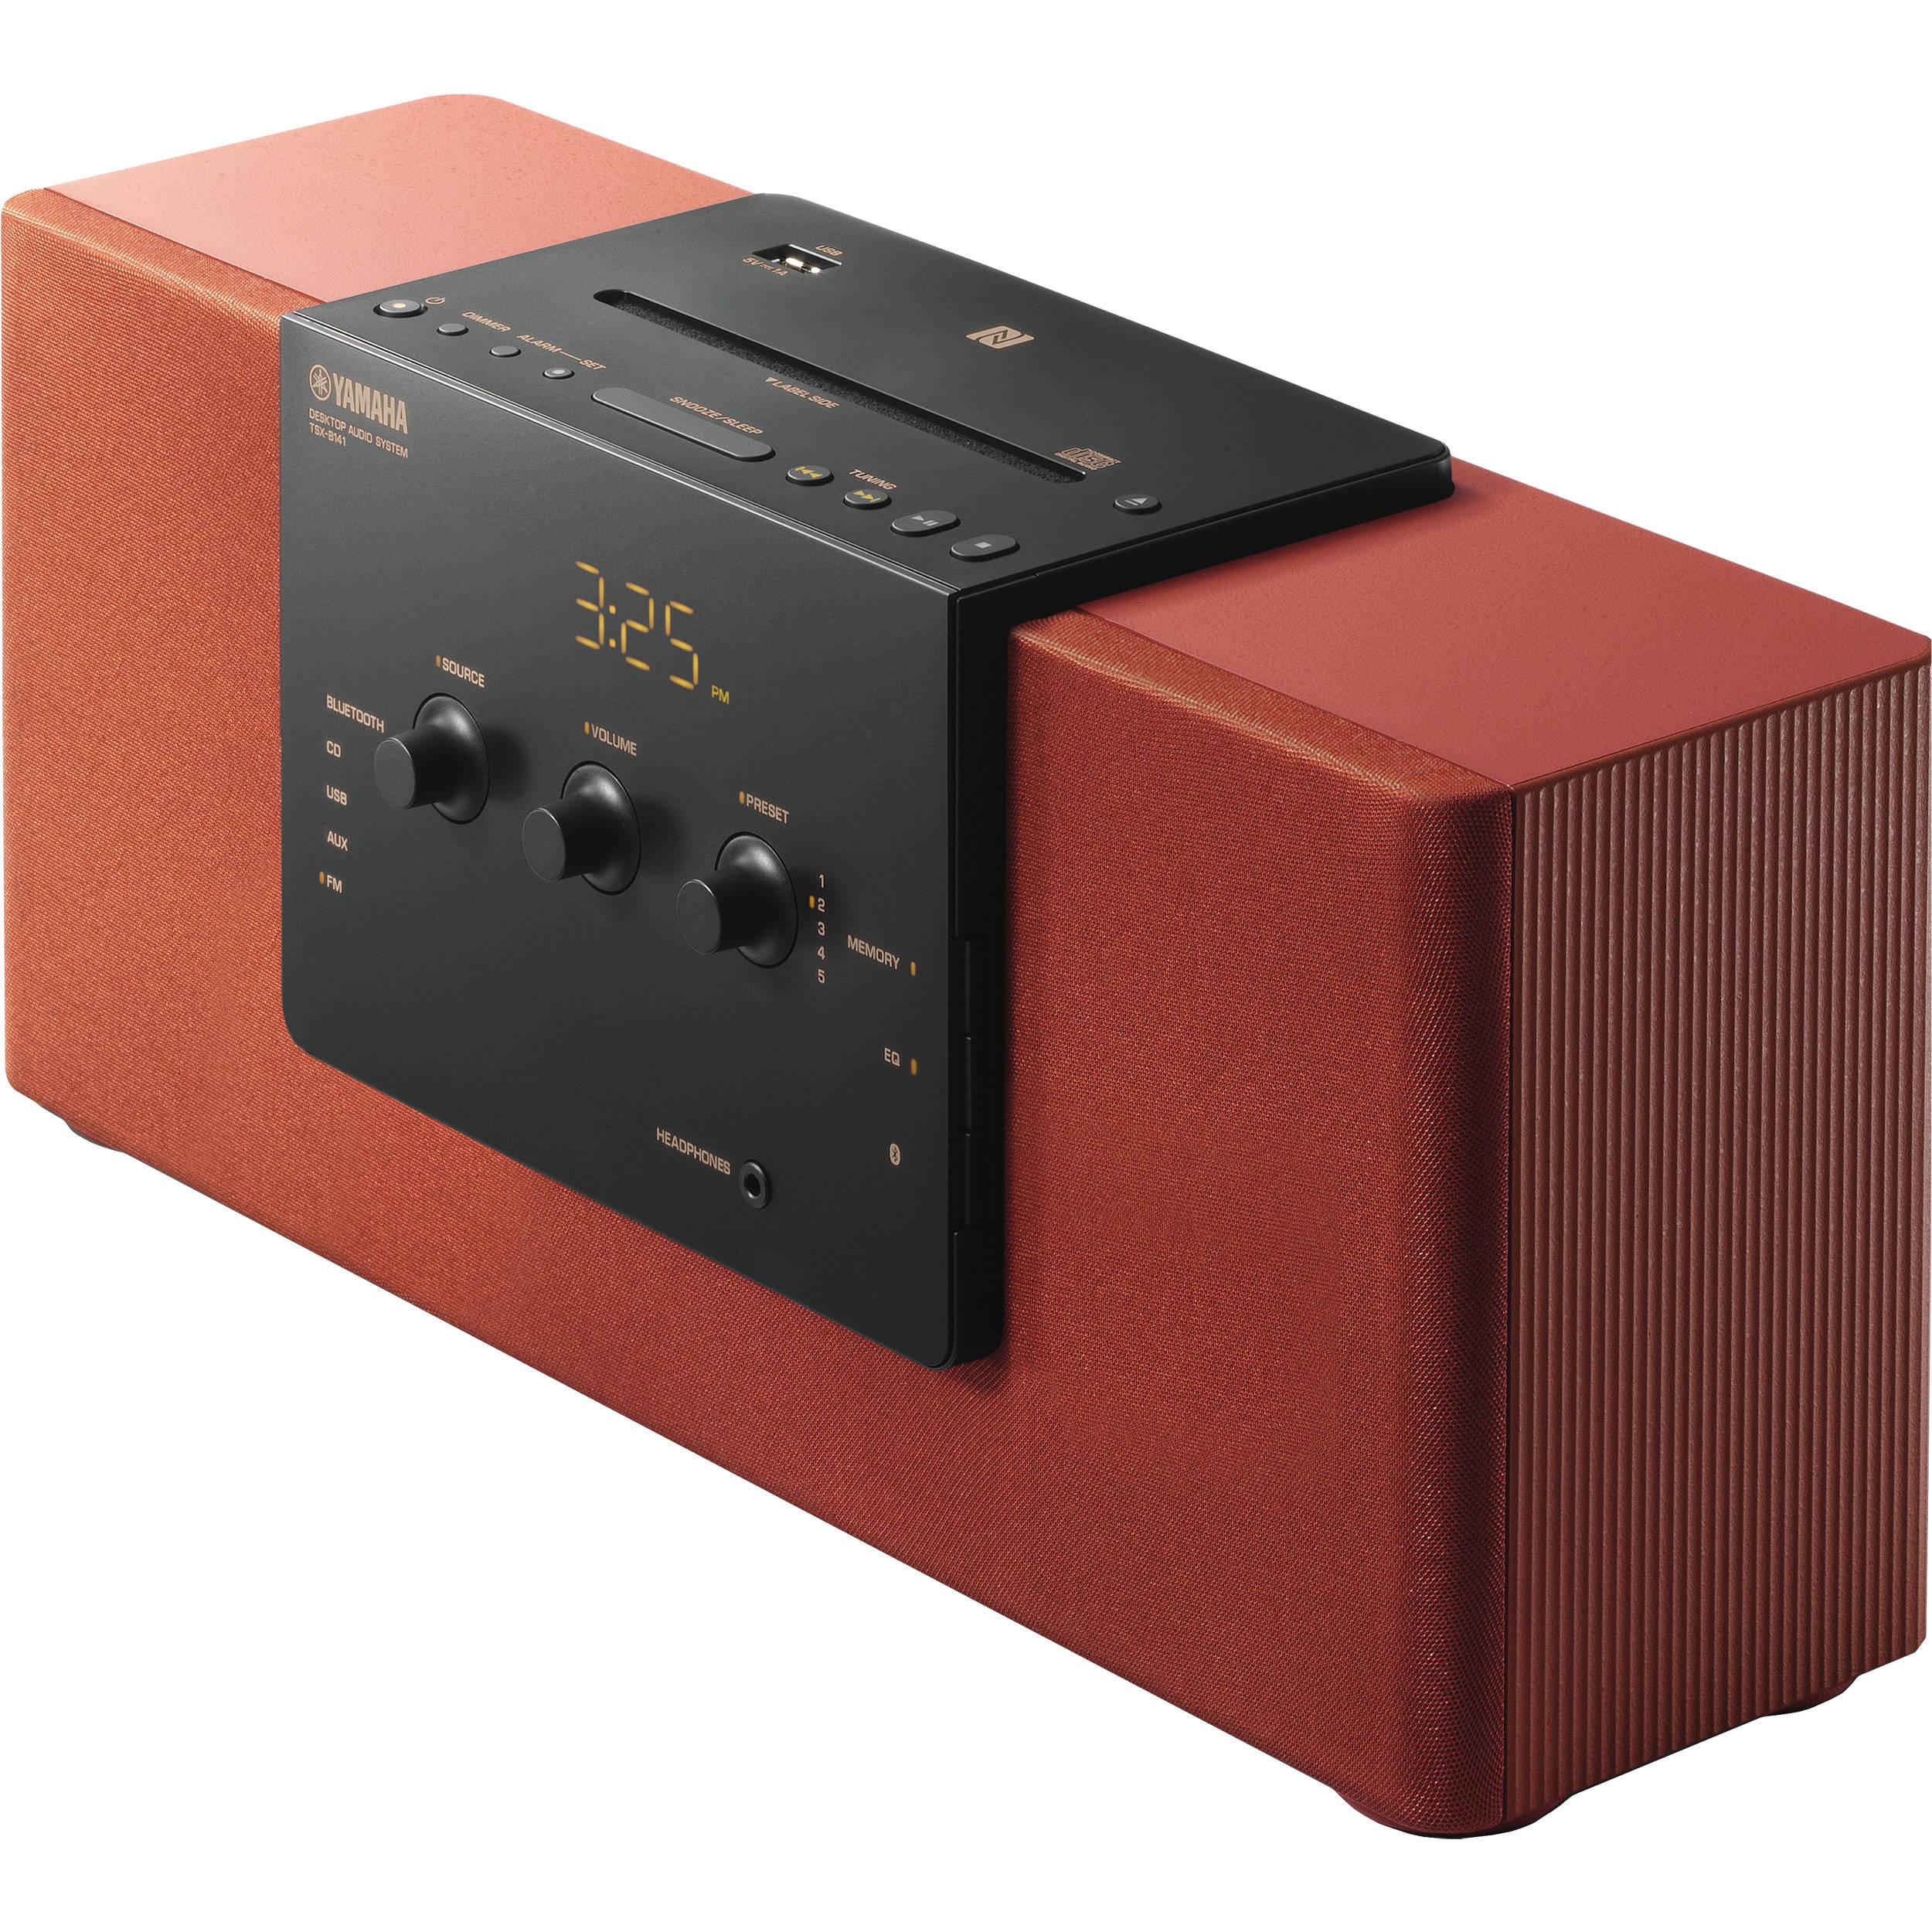 yamaha tsx b141 desktop audio system brick tsx b141br b h. Black Bedroom Furniture Sets. Home Design Ideas